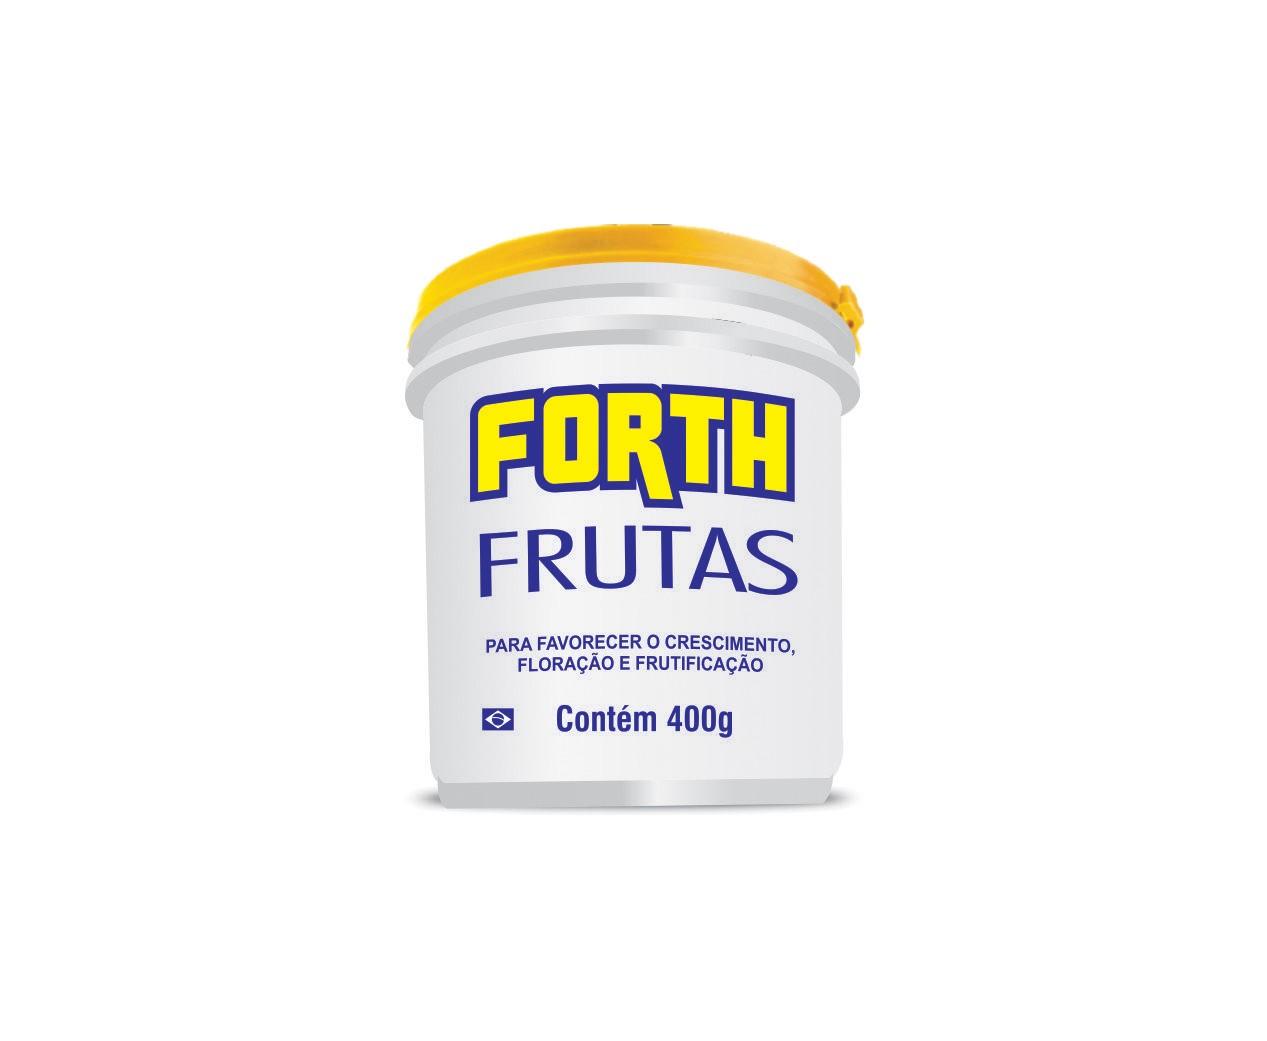 Fertilizante para plantas Forth Frutas 400g  - Vasos Raiz Loja Oficial